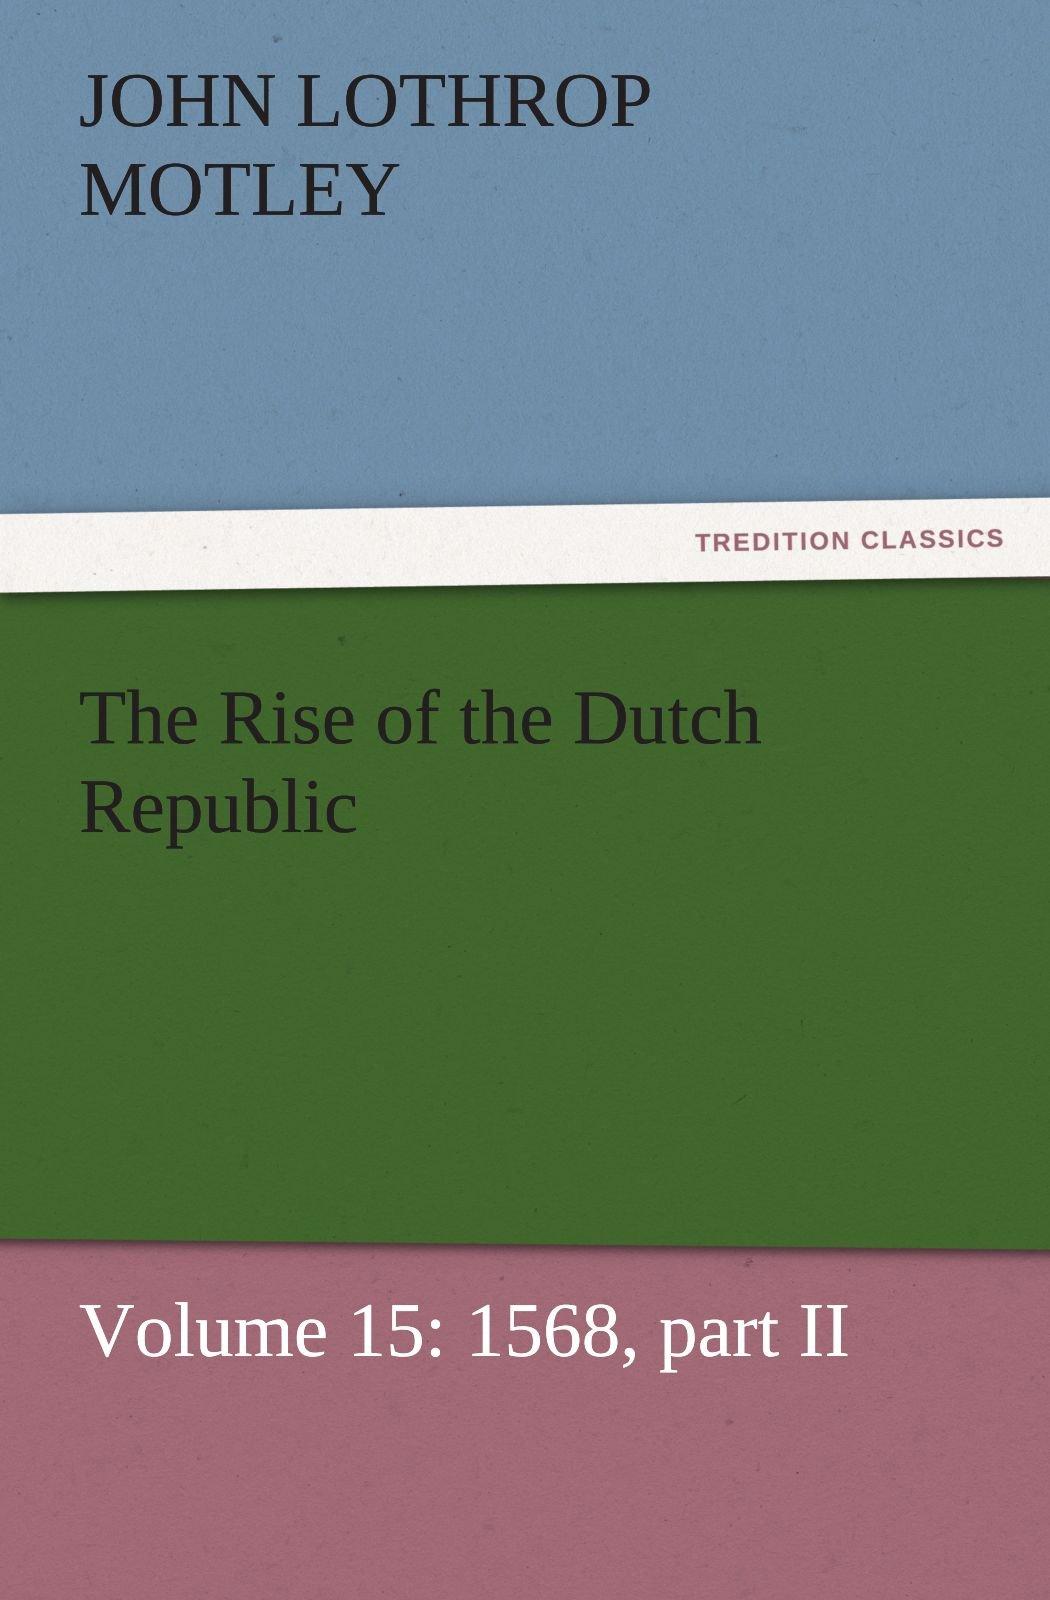 Download The Rise of the Dutch Republic — Volume 15: 1568, part II (TREDITION CLASSICS) ebook